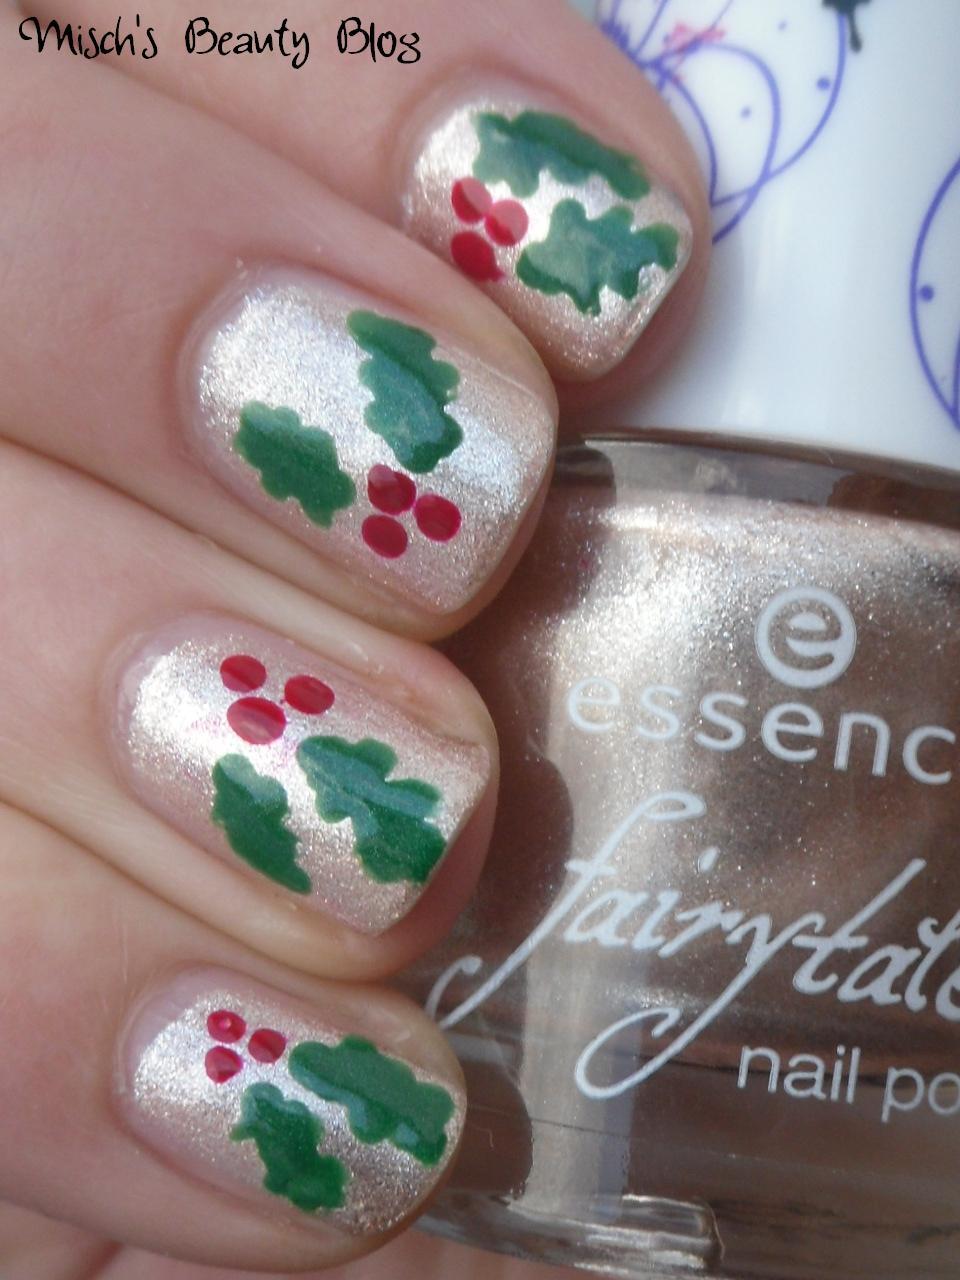 Misch S Beauty Blog Notd September 29th Fall Leaf Nail Art: Misch's Beauty Blog: NOTD December 21st: Holly Nails